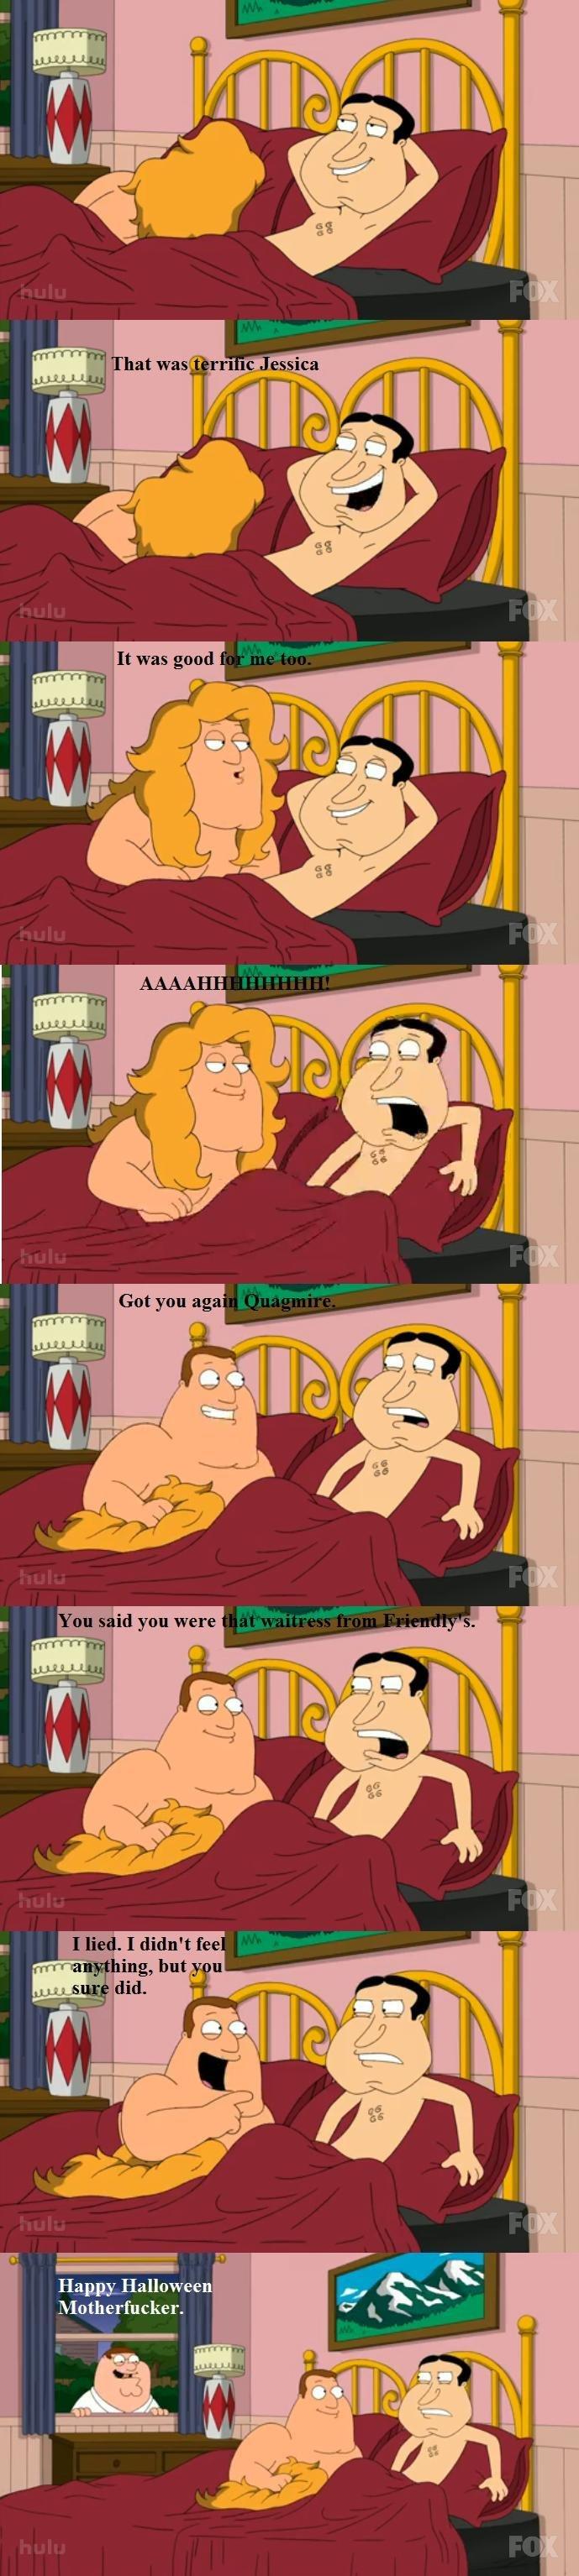 Family guy prank. giggedy giggedy goo.. wat episode Family guy prank giggedy goo wat episode